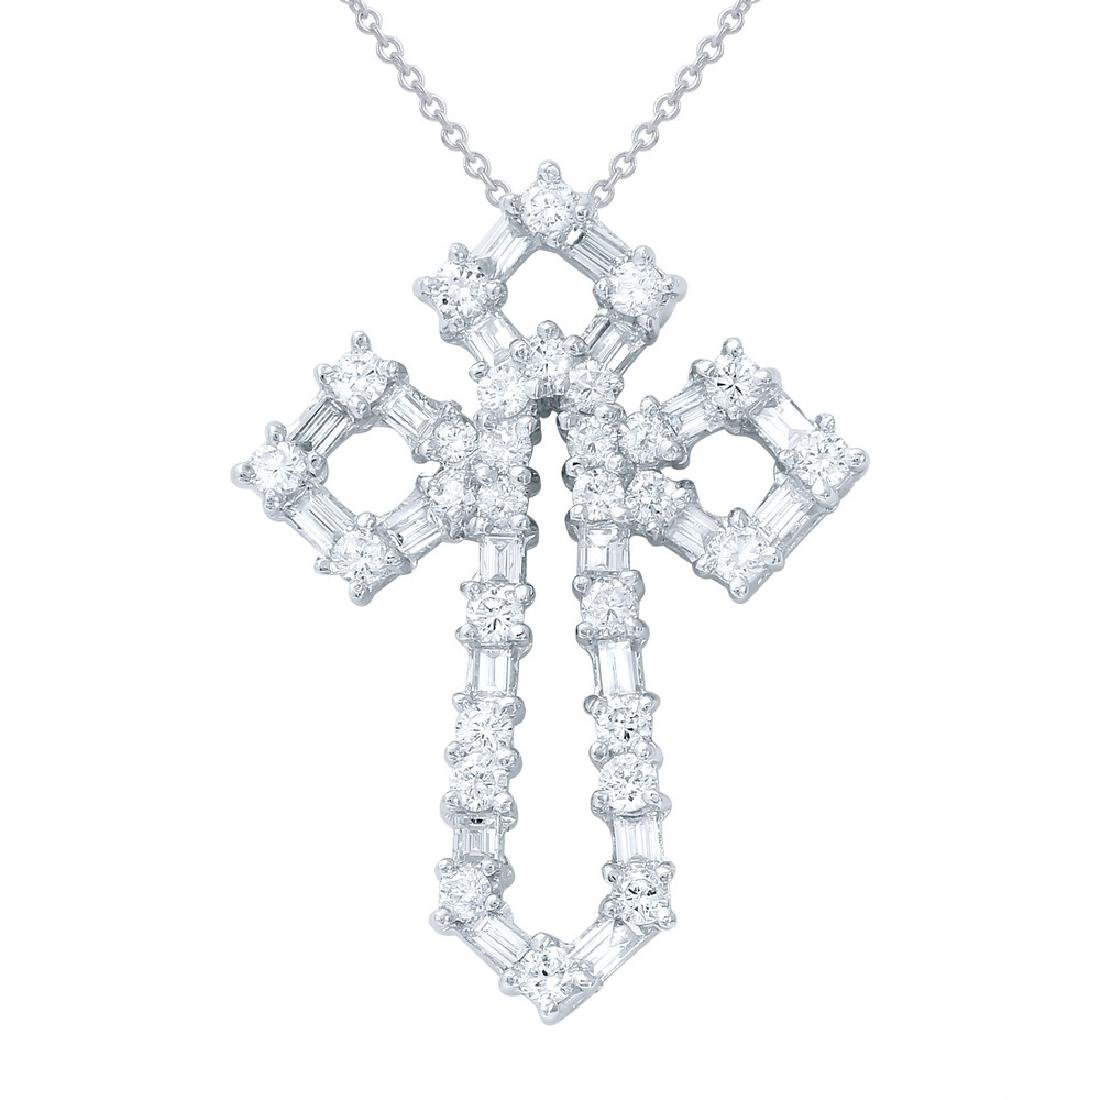 Genuine 1.48 TCW 18K White Gold Ladies Necklace